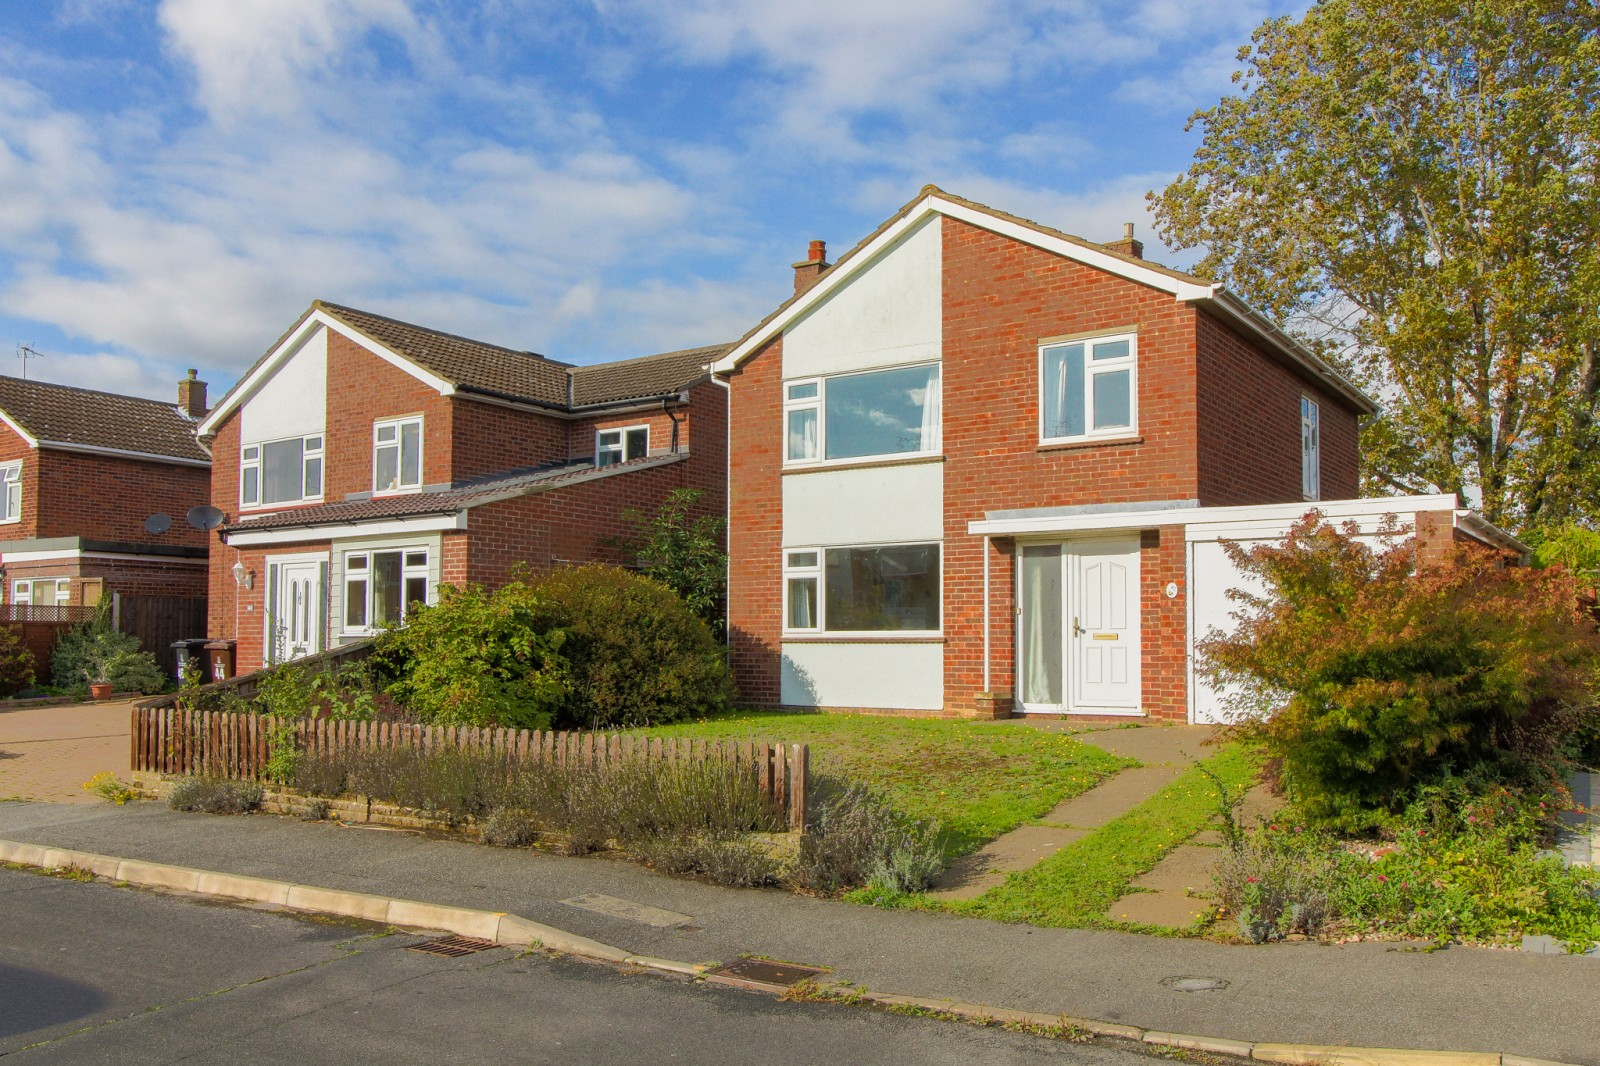 Juniper Road, Stanway, Colchester, Essex, CO3